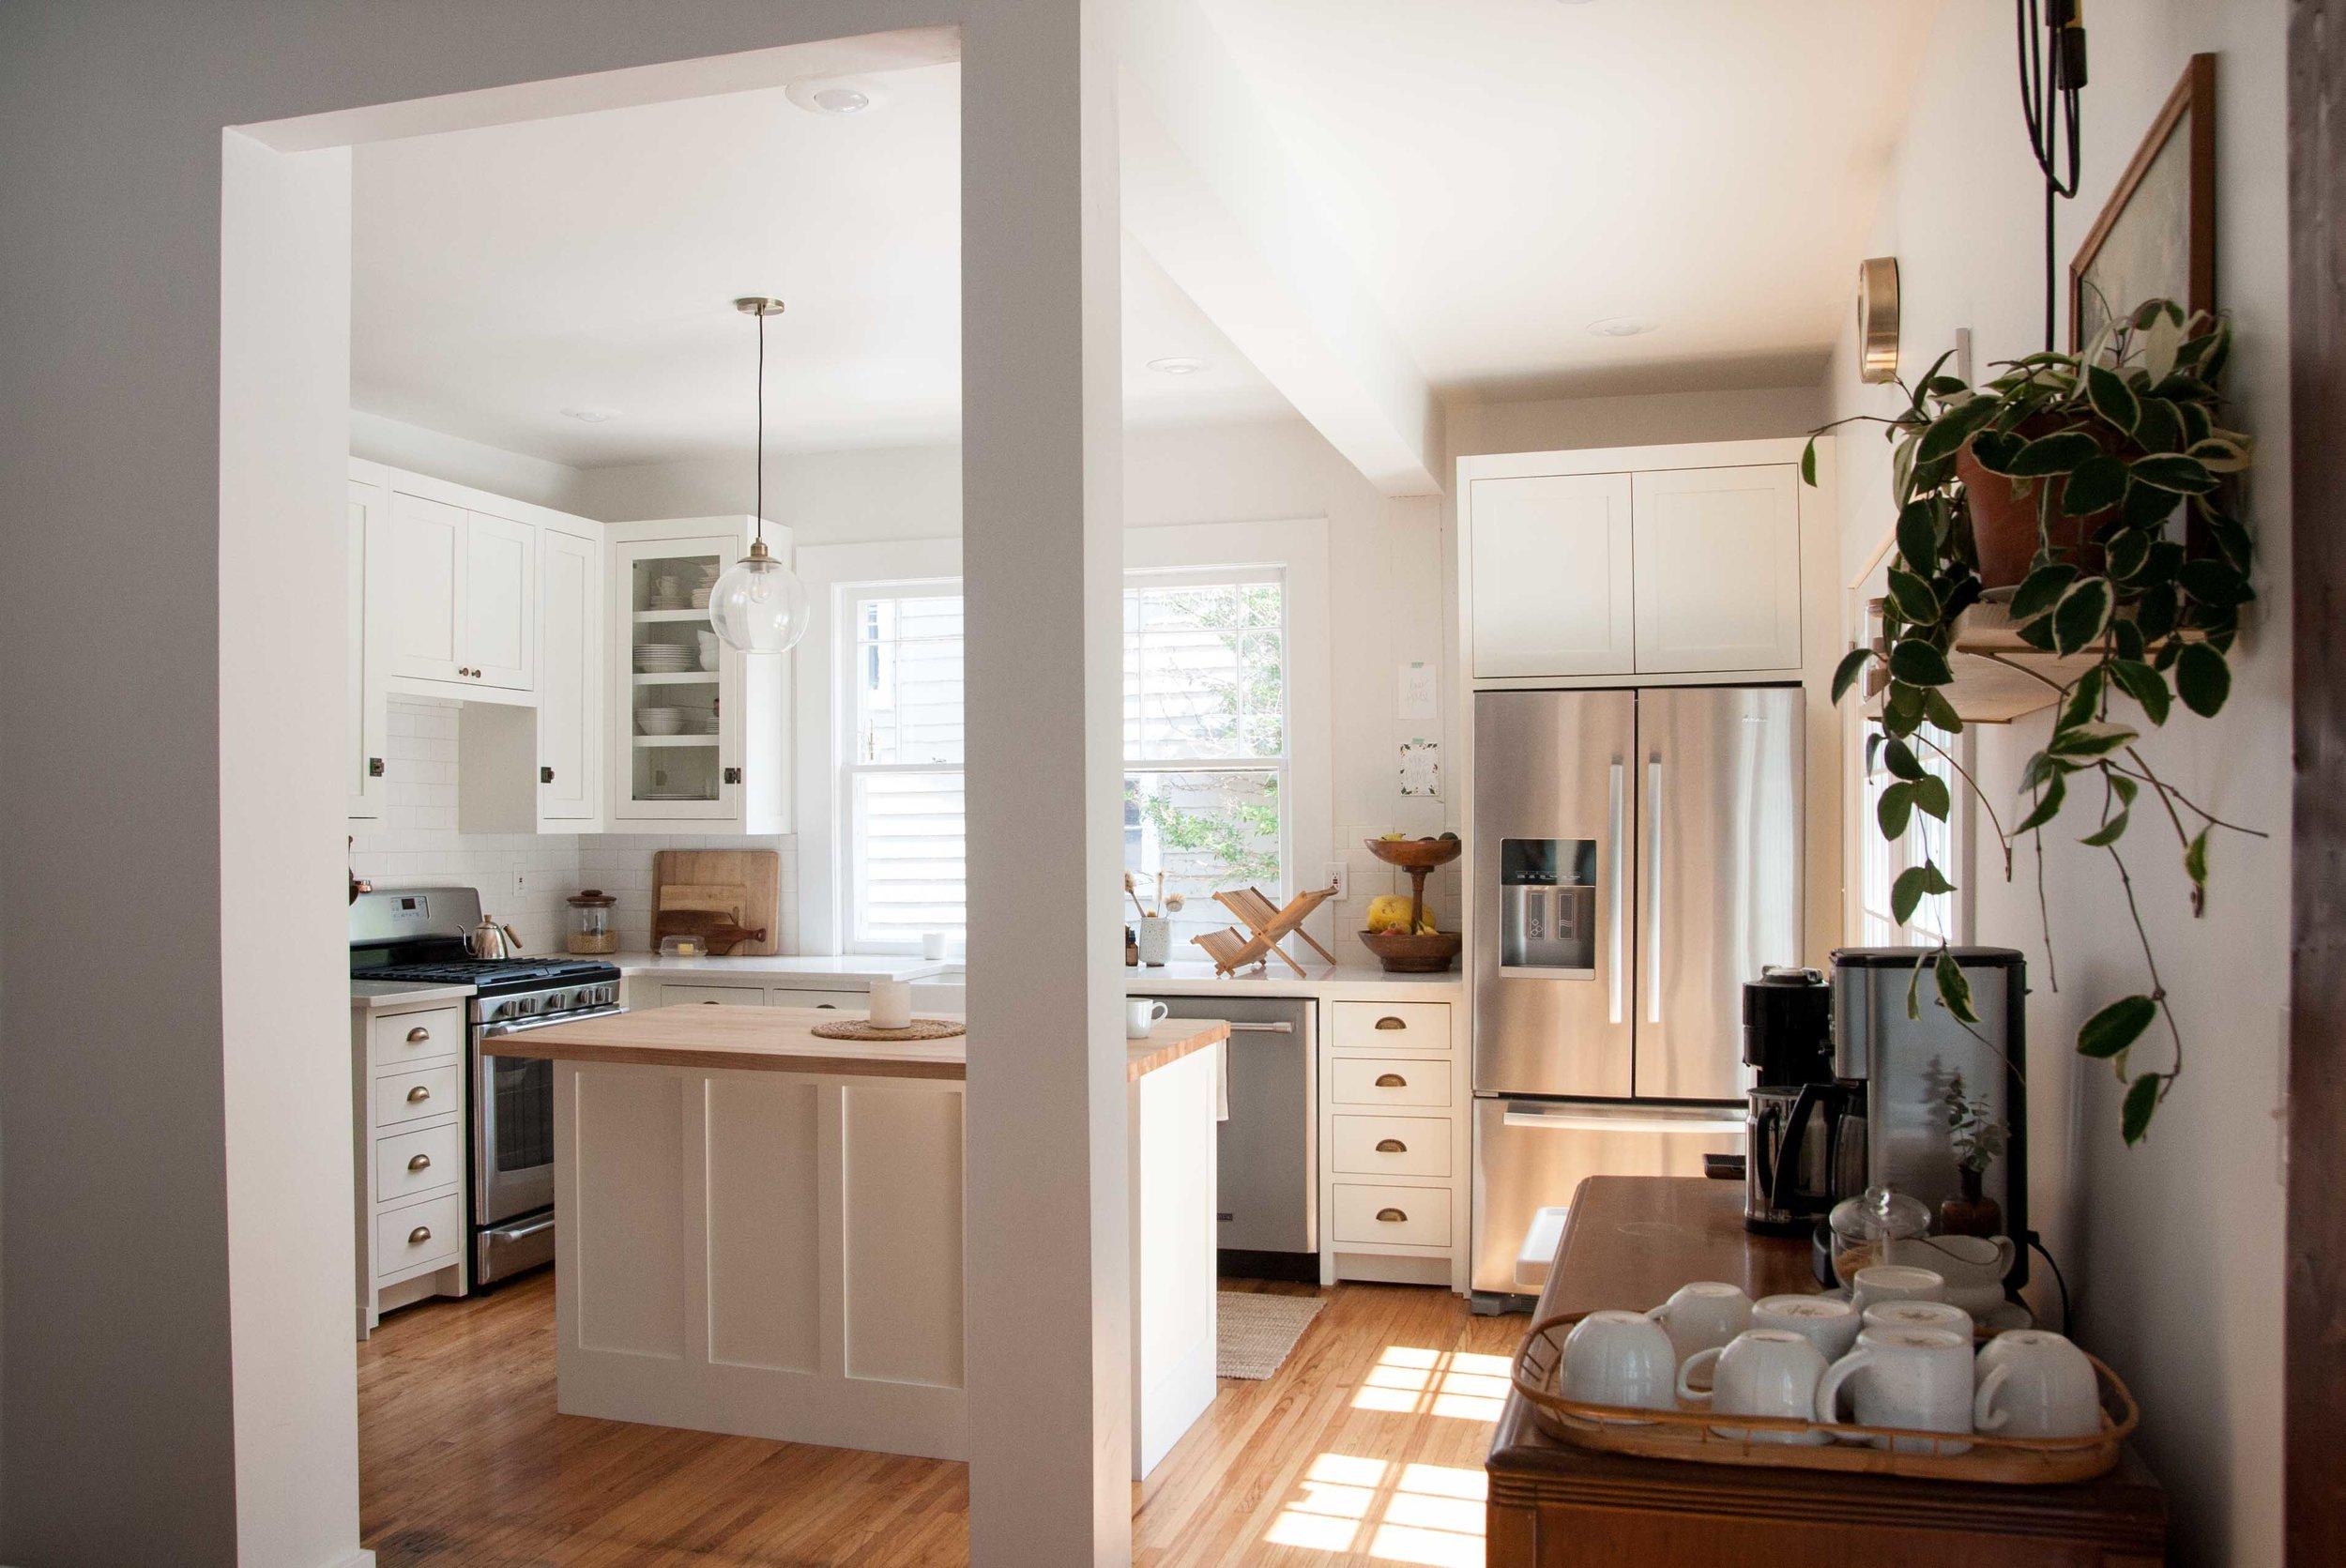 light-bright-earthy-kitchen